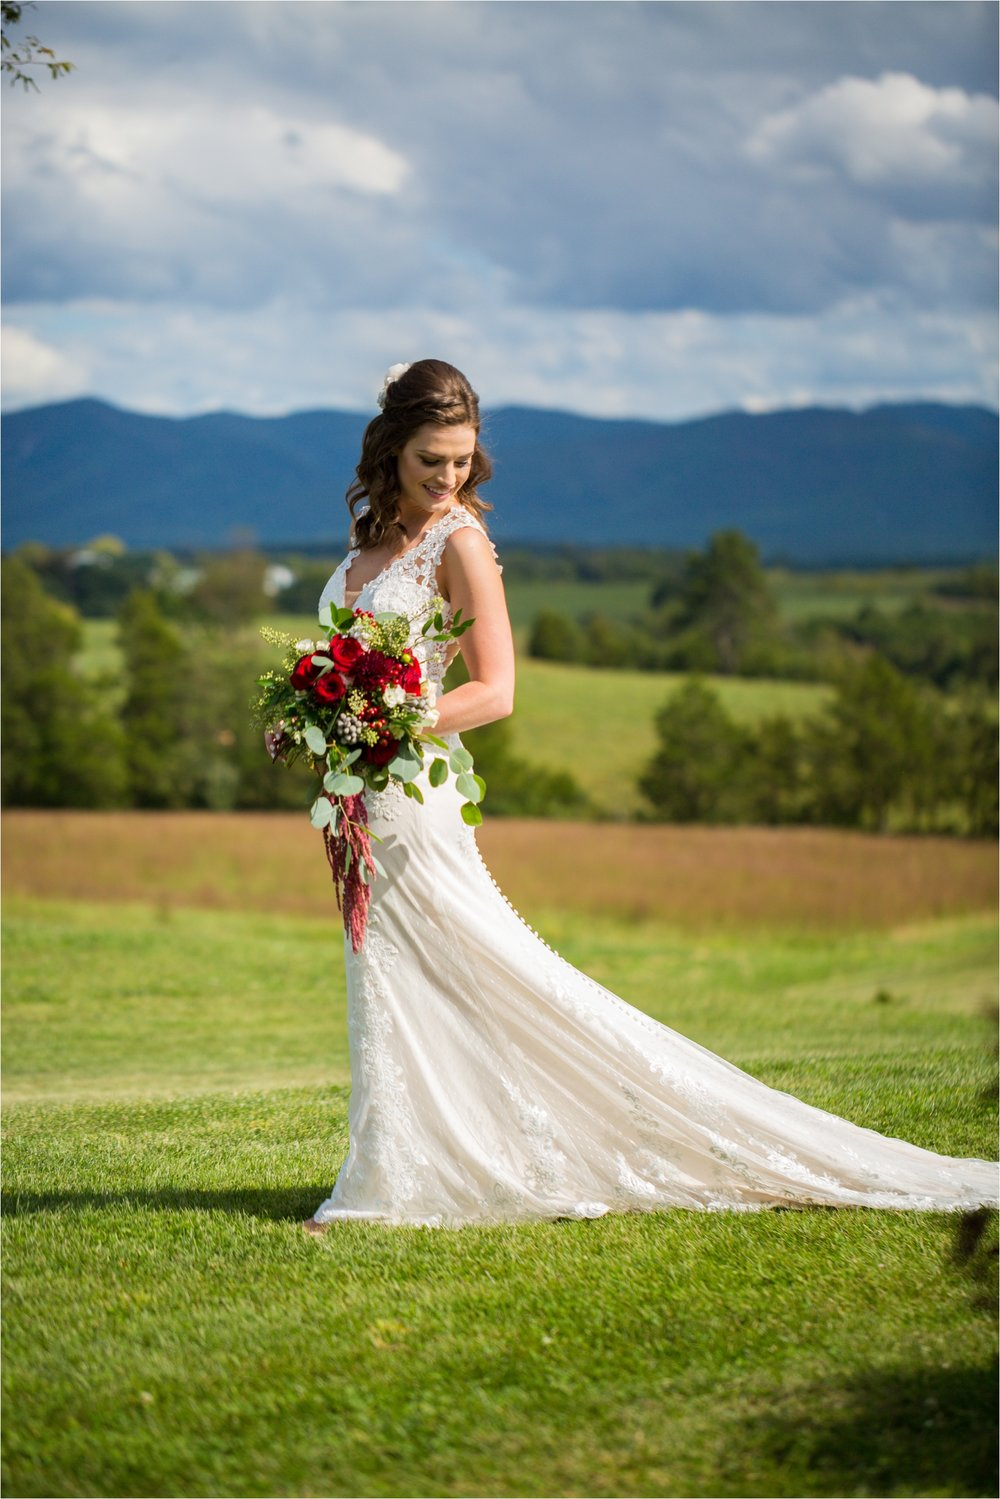 Feather-and-Oak-Photography-Cross-Keys-Vineyard-Wedding-0446.jpg